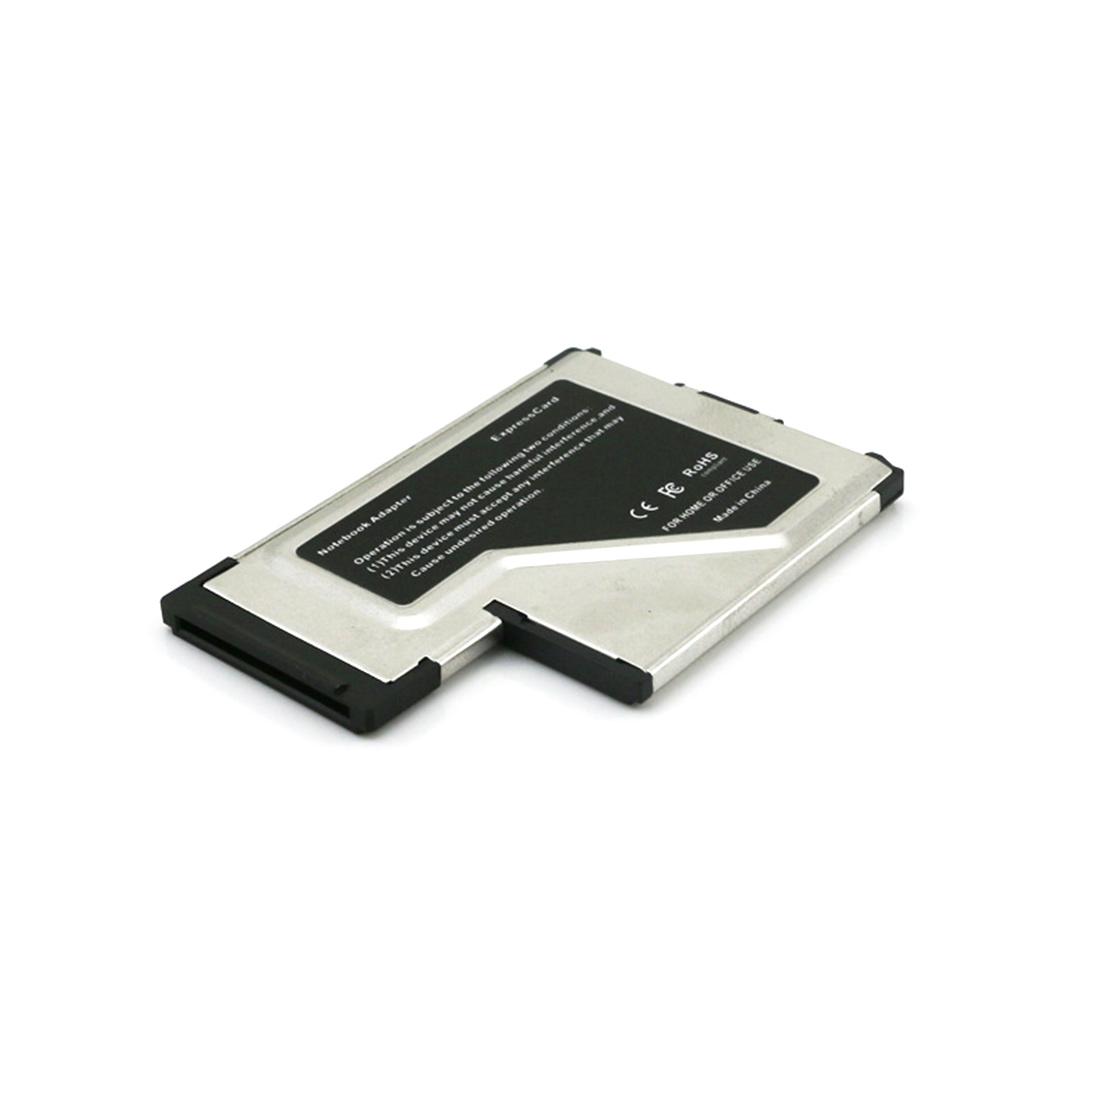 JMT 2 Dual Ports USB 3.0 HUB Express Card ExpressCard 54mm Hidden Adapter Converter USB3.0 for PCMCIA Laptop PC